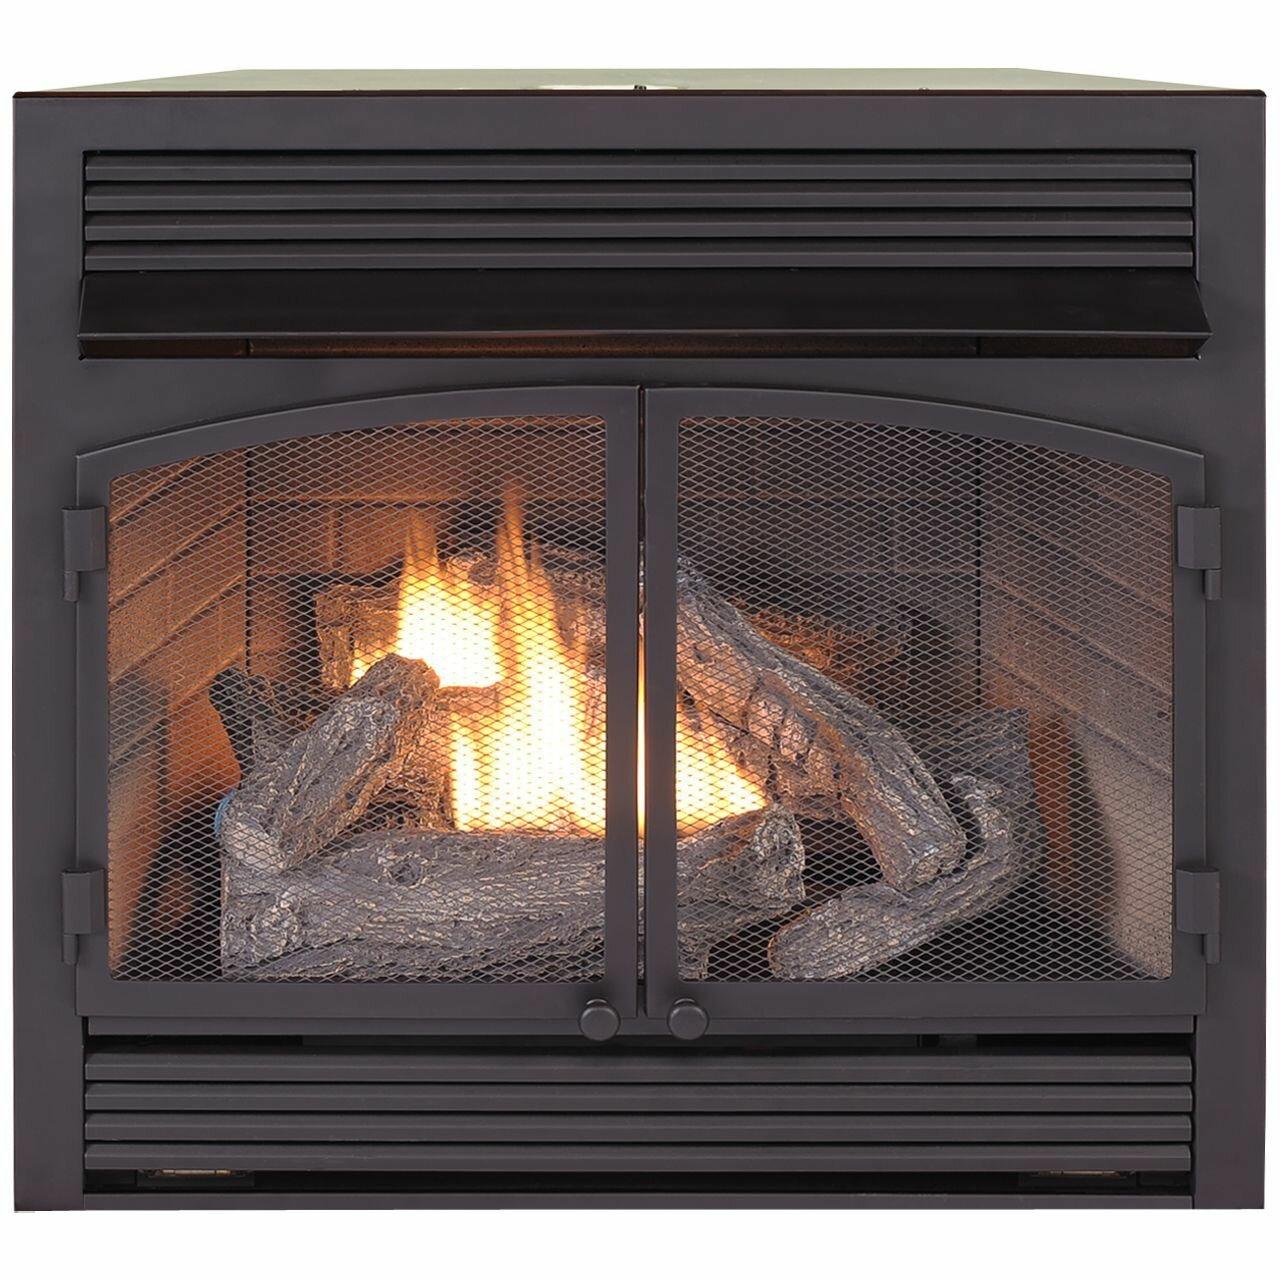 Prime Stone Gas Fireplace Wayfair Interior Design Ideas Jittwwsoteloinfo